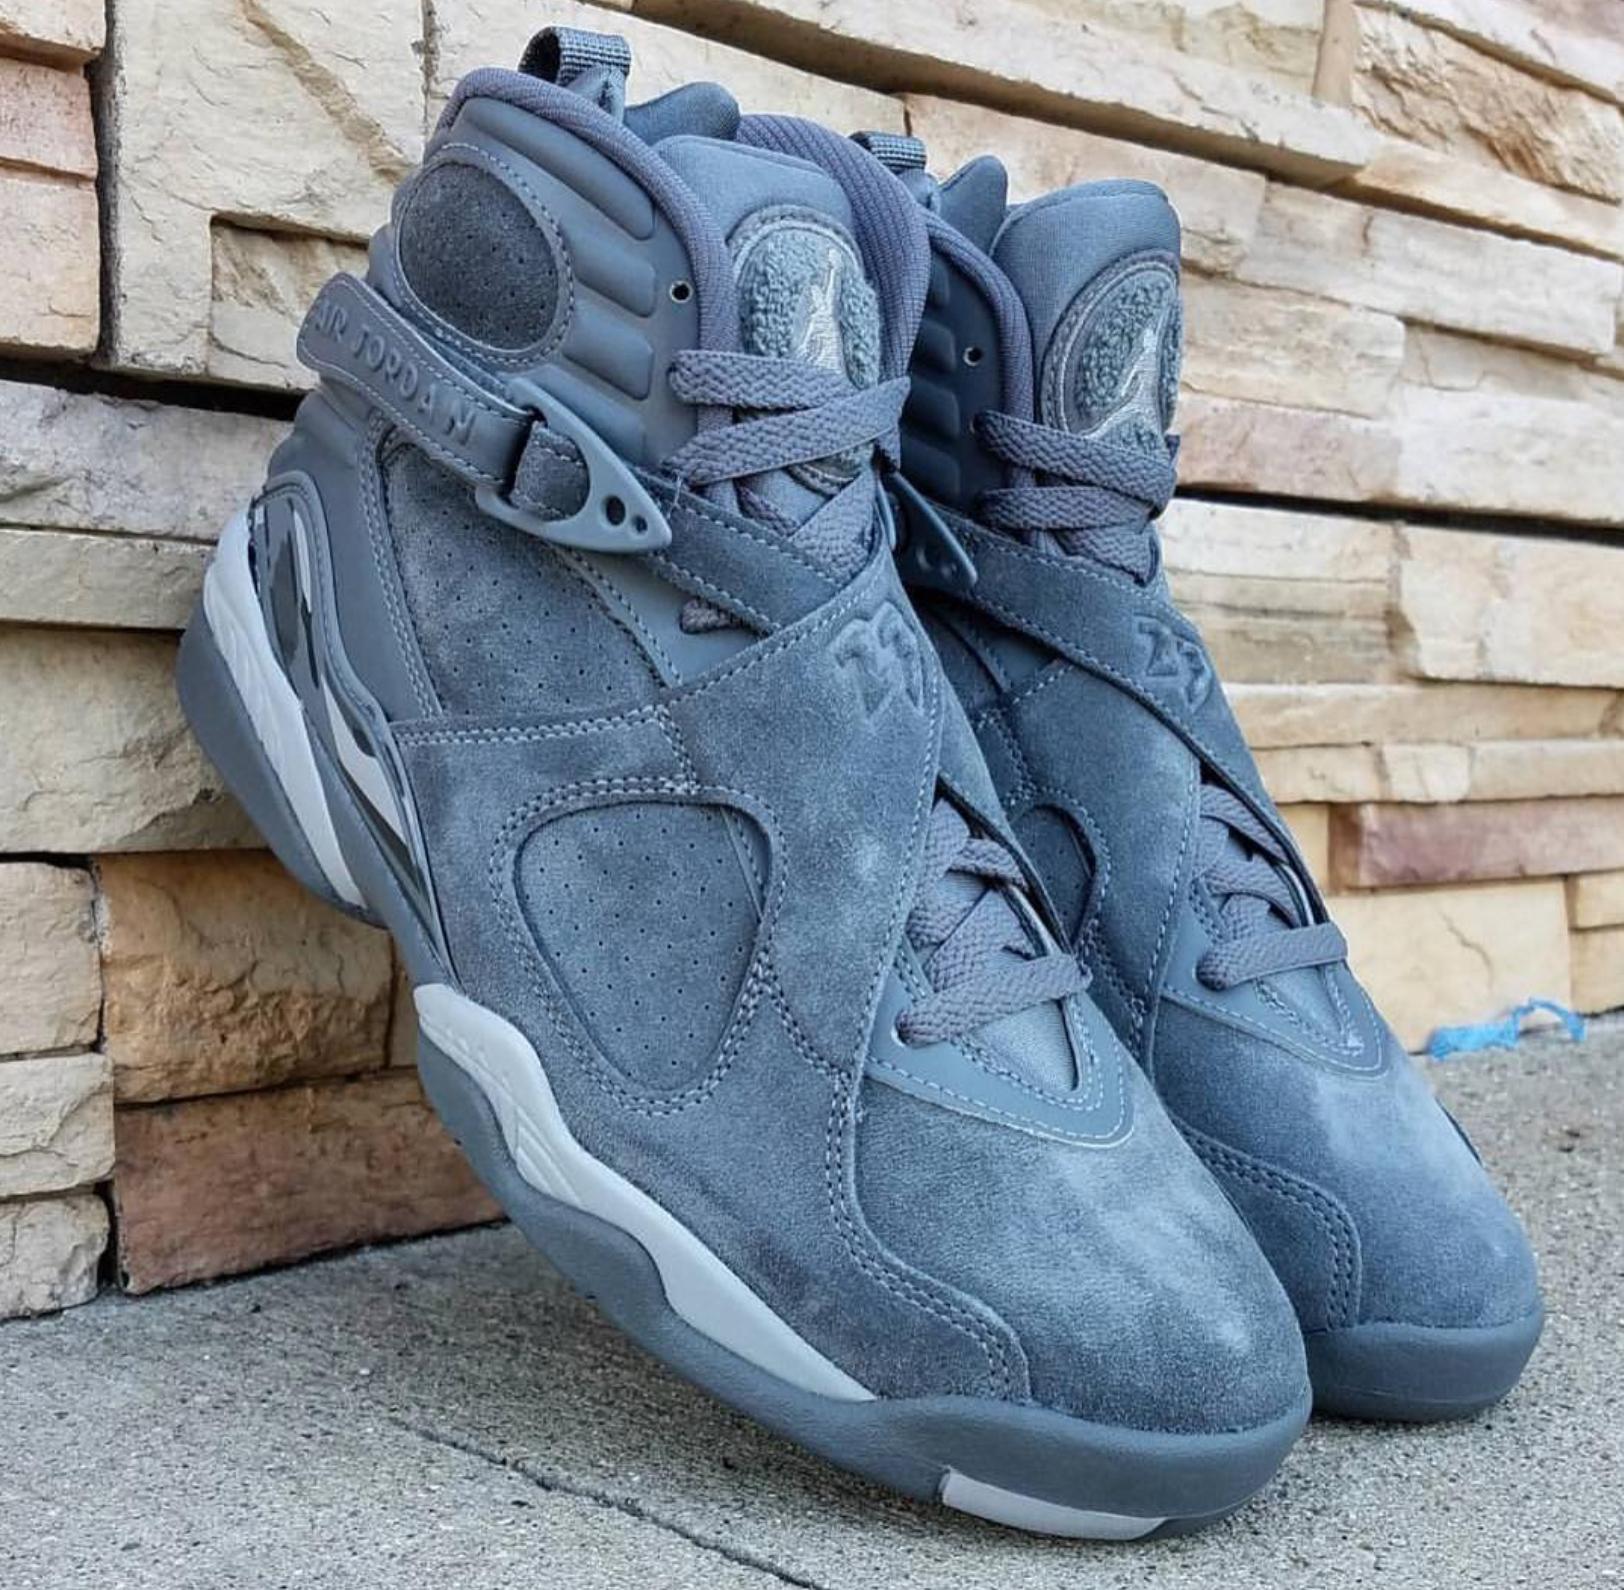 info for de8c6 5b8a3 free shipping air jordan 8 retro cool grey kaws sneakers ef4ee 62c26  shop  aug8. jordan brand kicks on court retro lifestyle b1e57 db26e